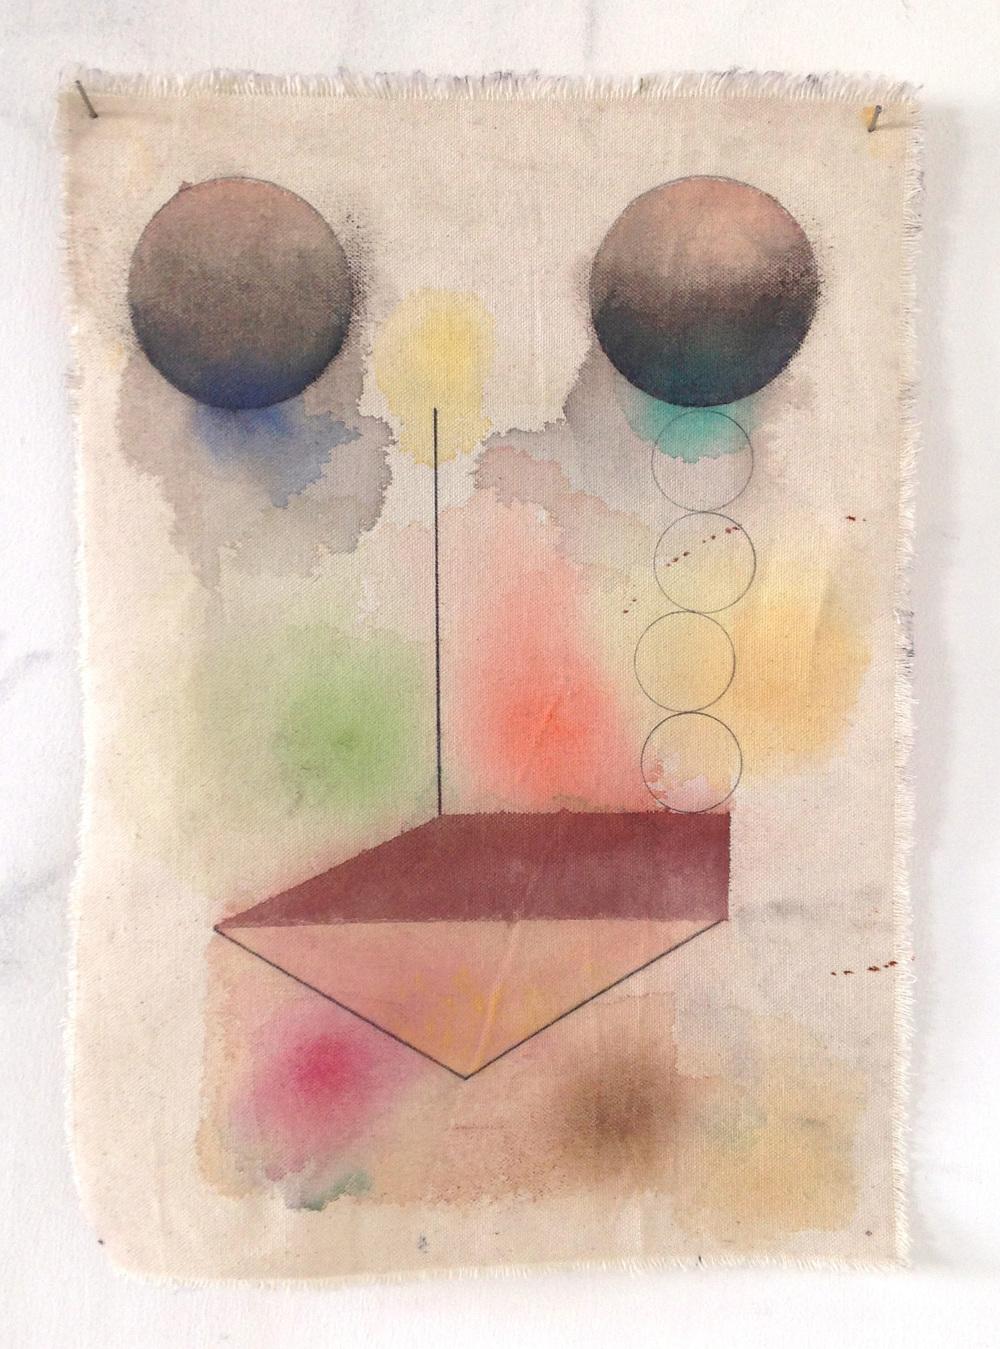 William Stein - Jessica Carlisle Gallery - NYC - Humphrey Munson Blog 'On+Serdica'+39.5x28.5cm